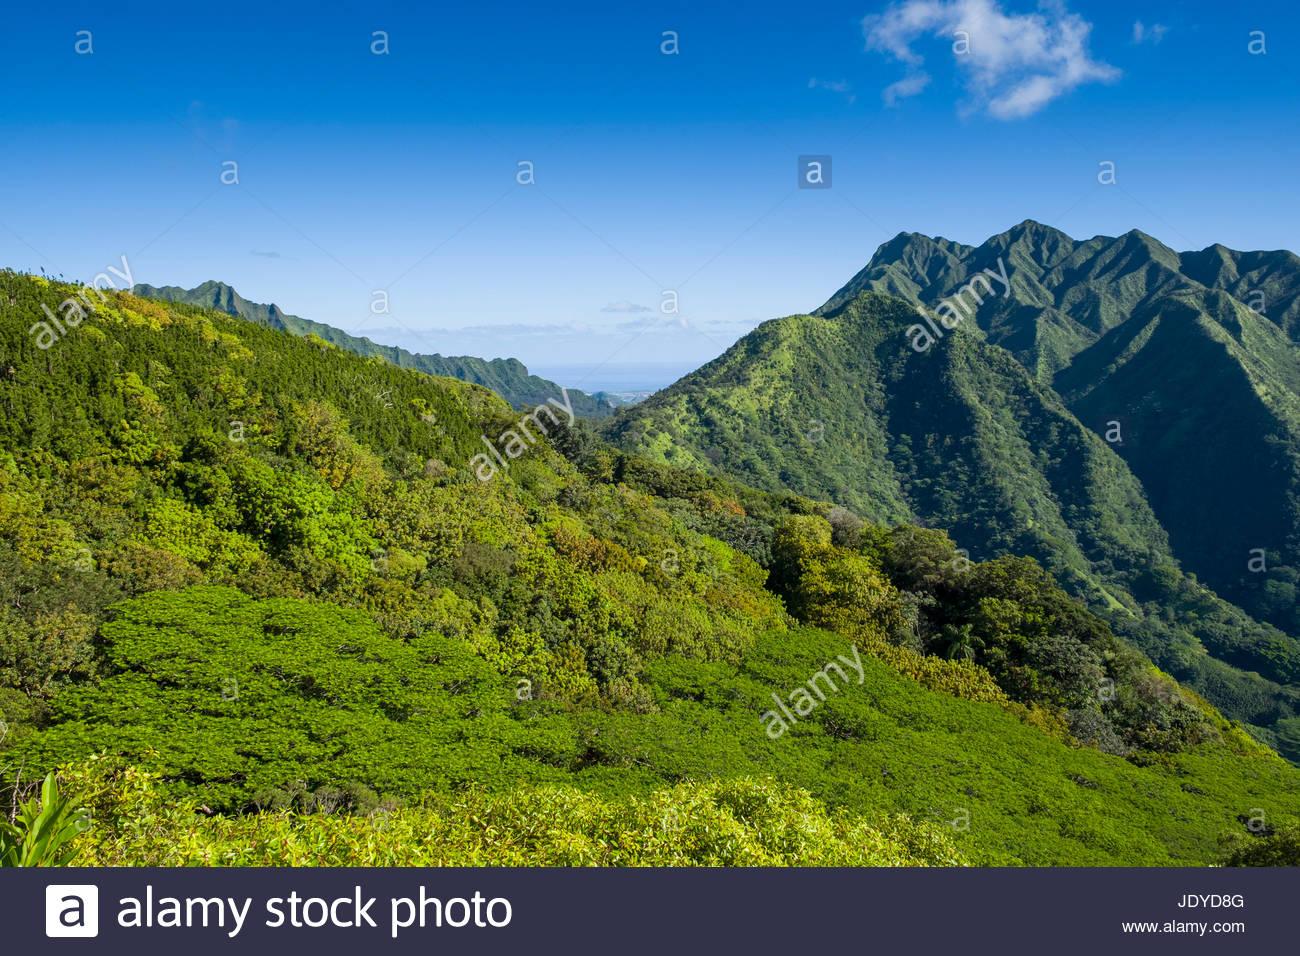 Koolau Mountain Range, Honolulu Watershed Forest Reserve, Honolulu, Oahu, Hawaii, USA - Stock Image